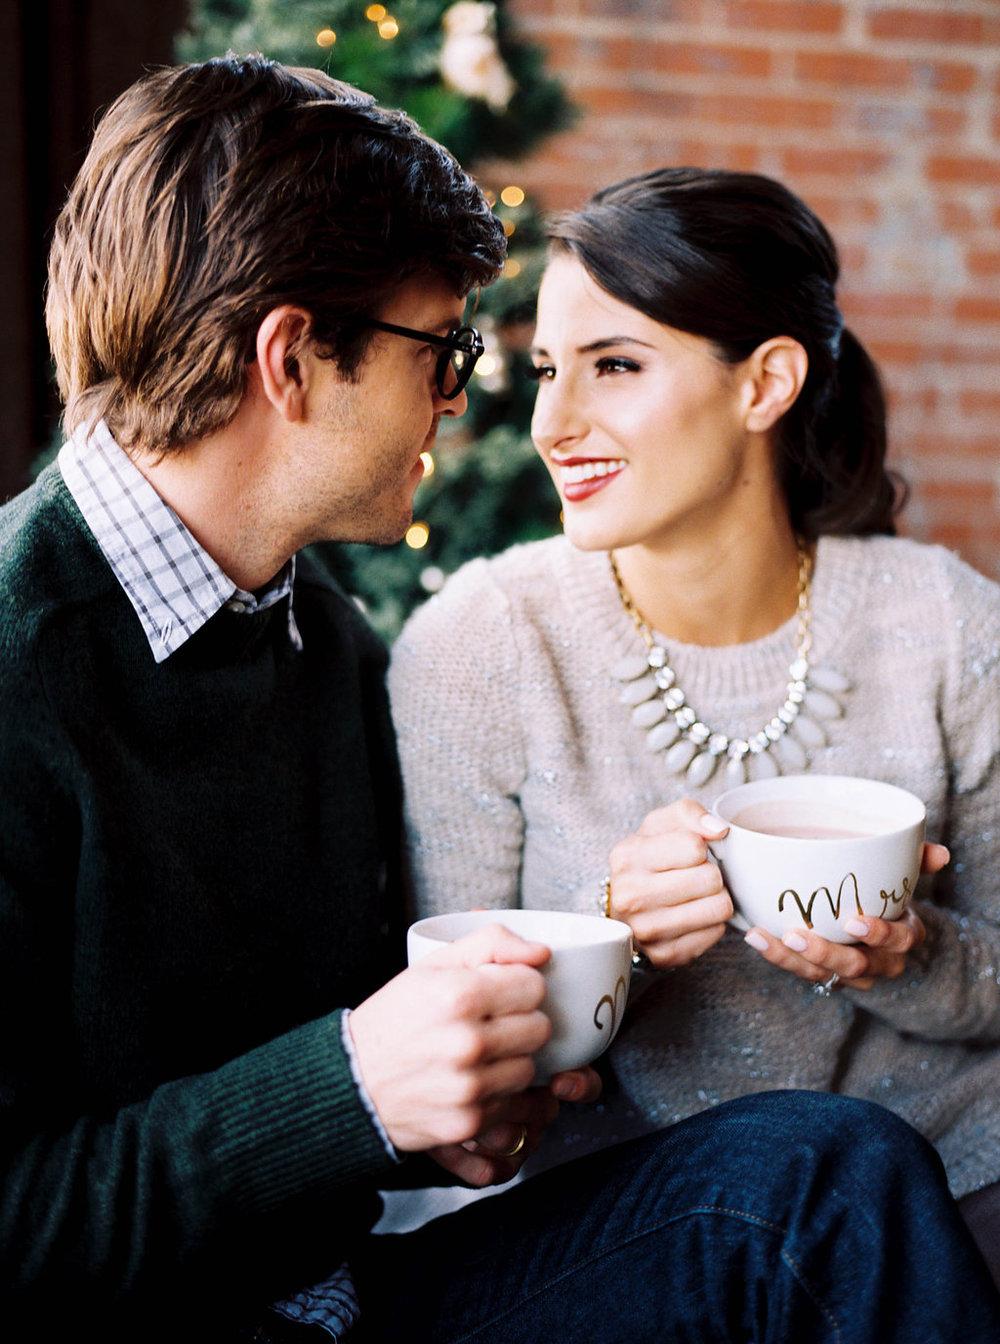 Newlywed_Christmas_31.JPG